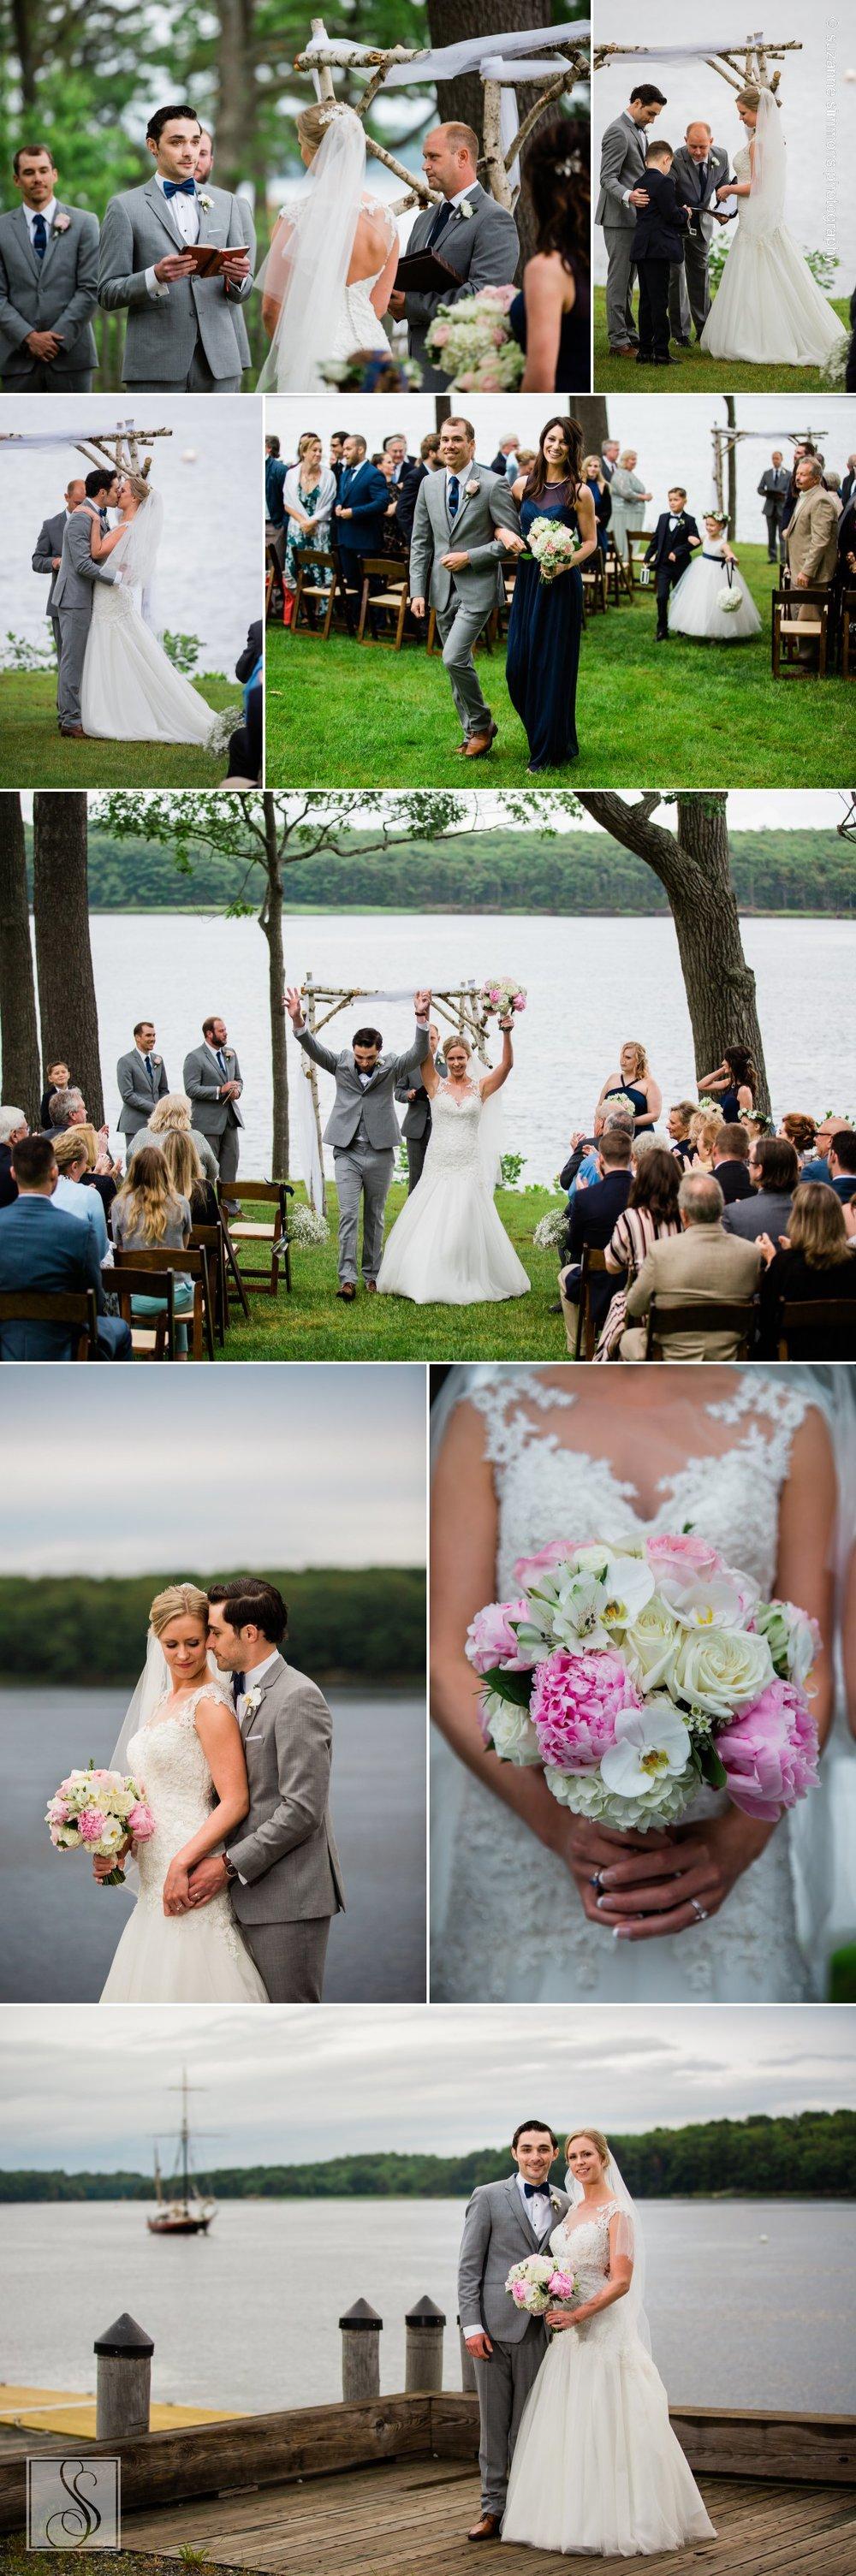 Wedding ceremony at Maine Maritime Museum in Bath, Maine